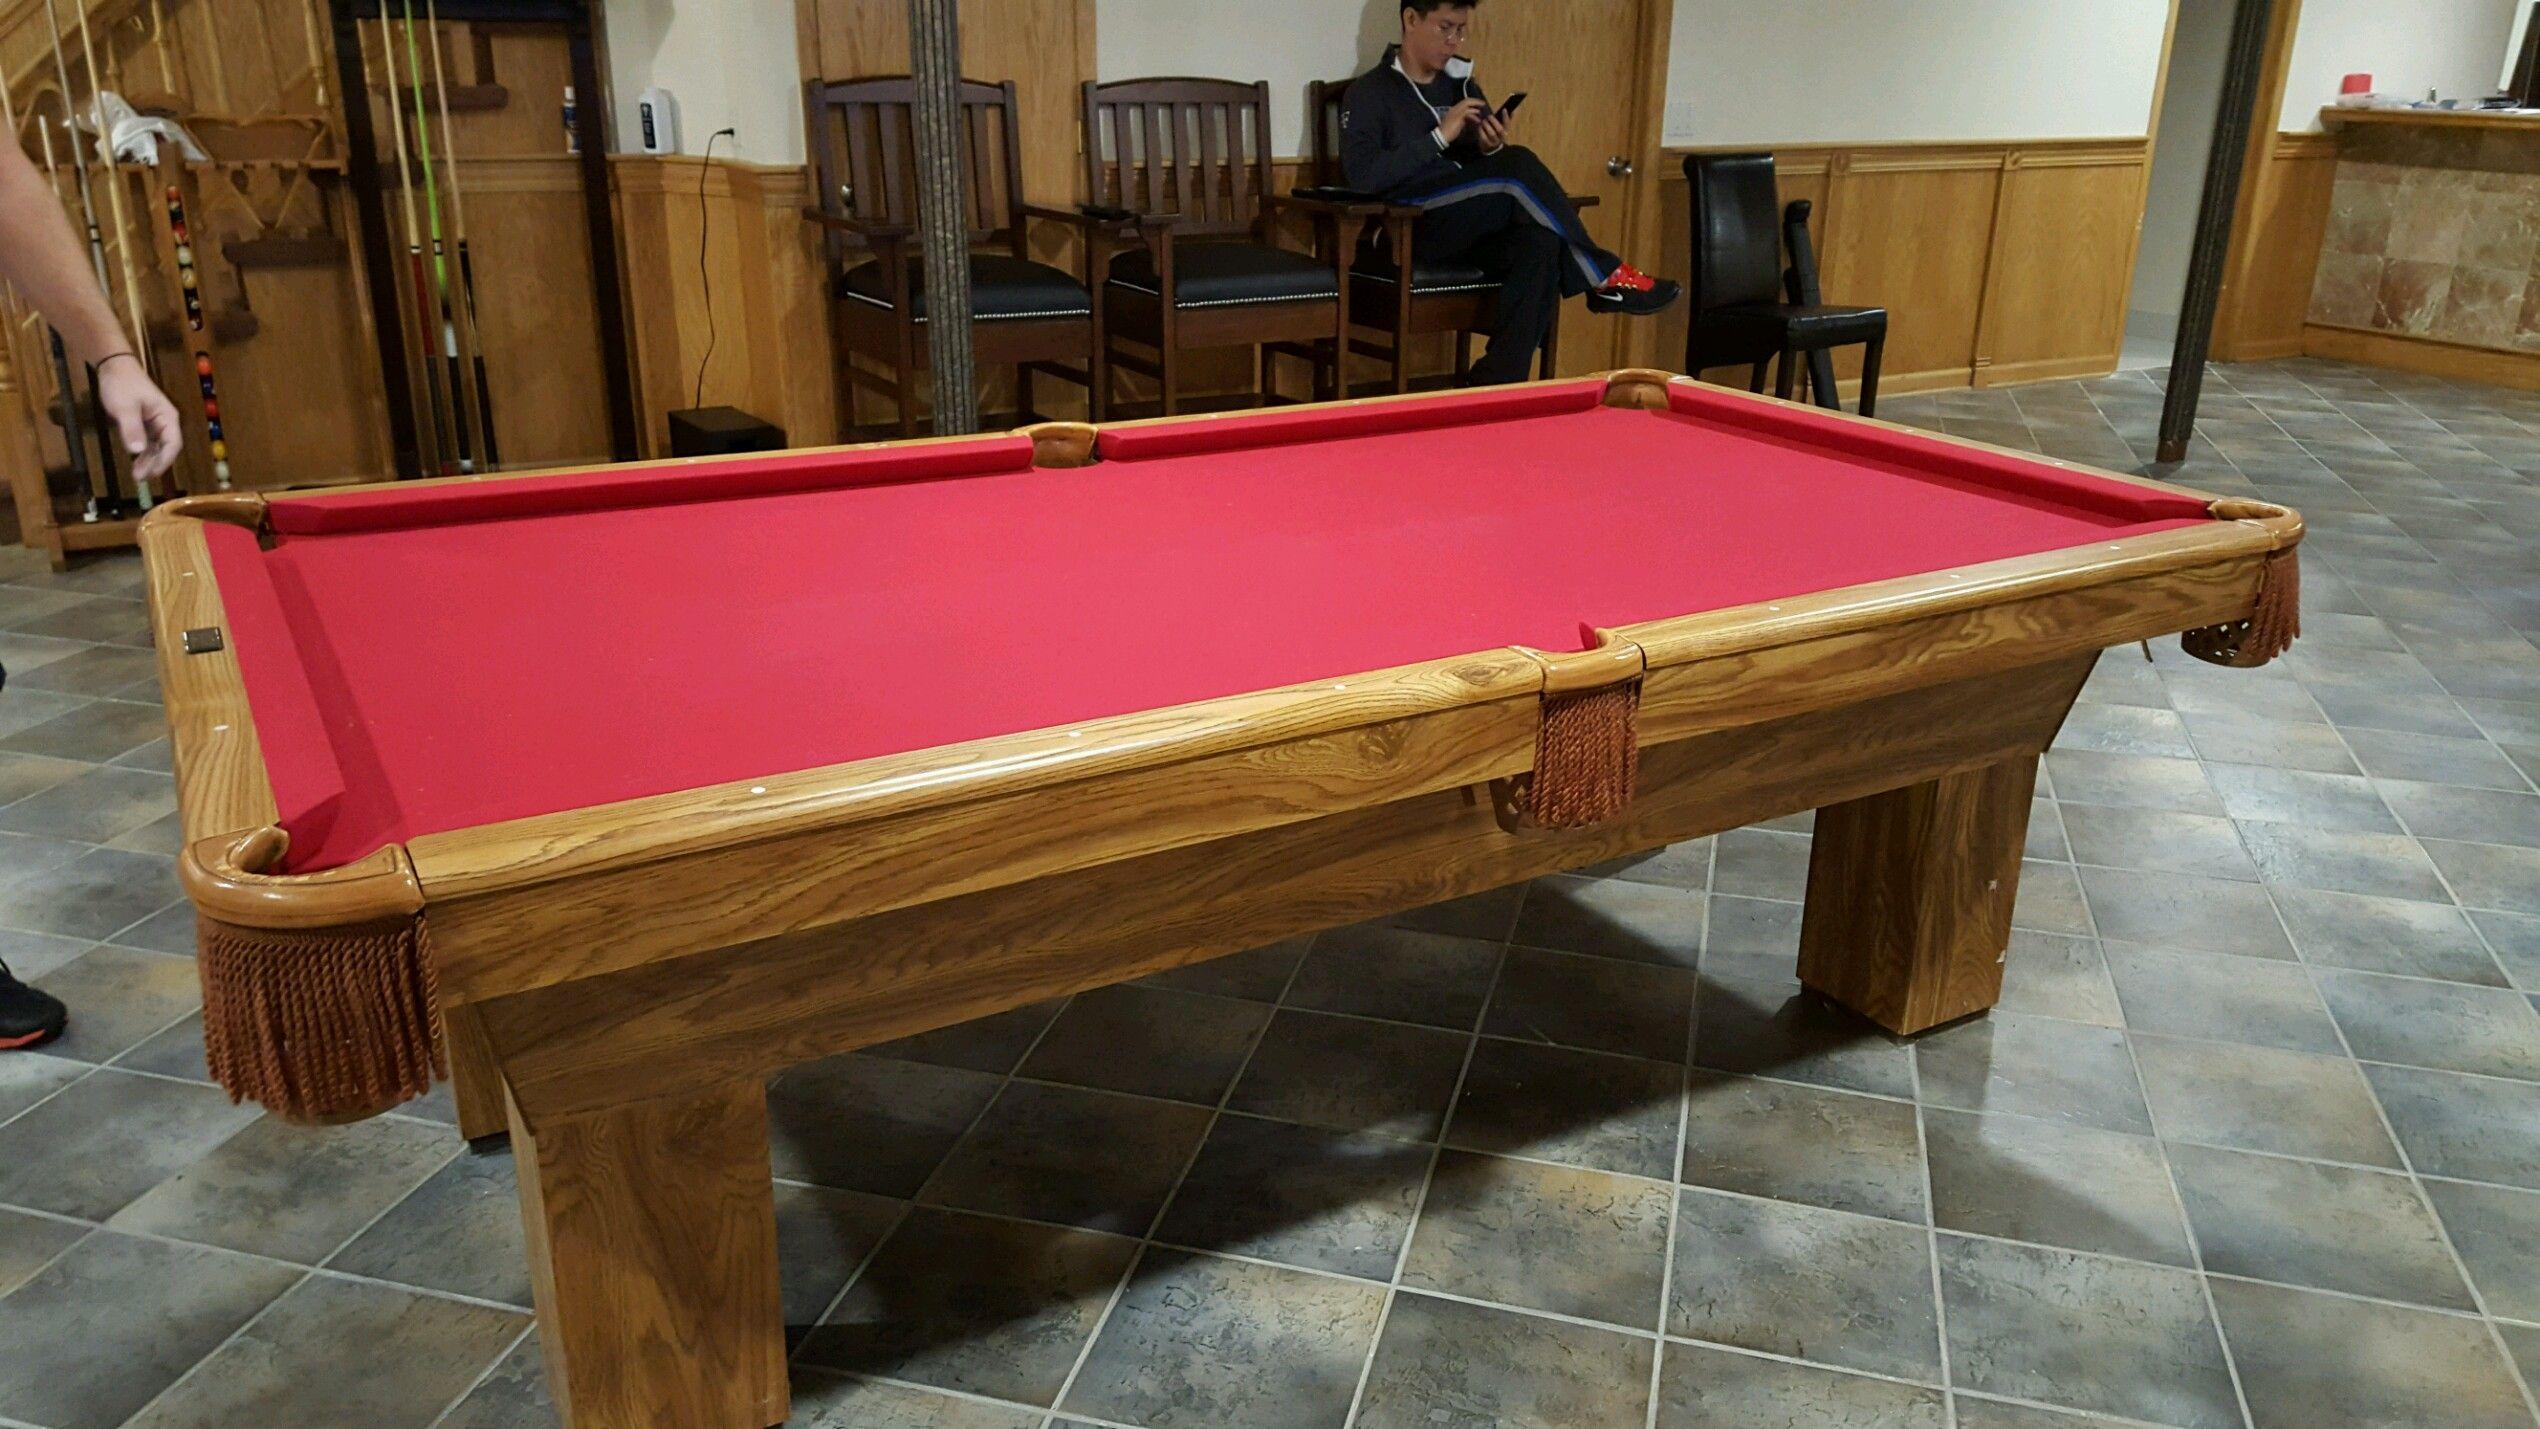 Brunswick Billiards Scottsdale Pool Table Sold Used Pool Tables - Brunswick brighton pool table